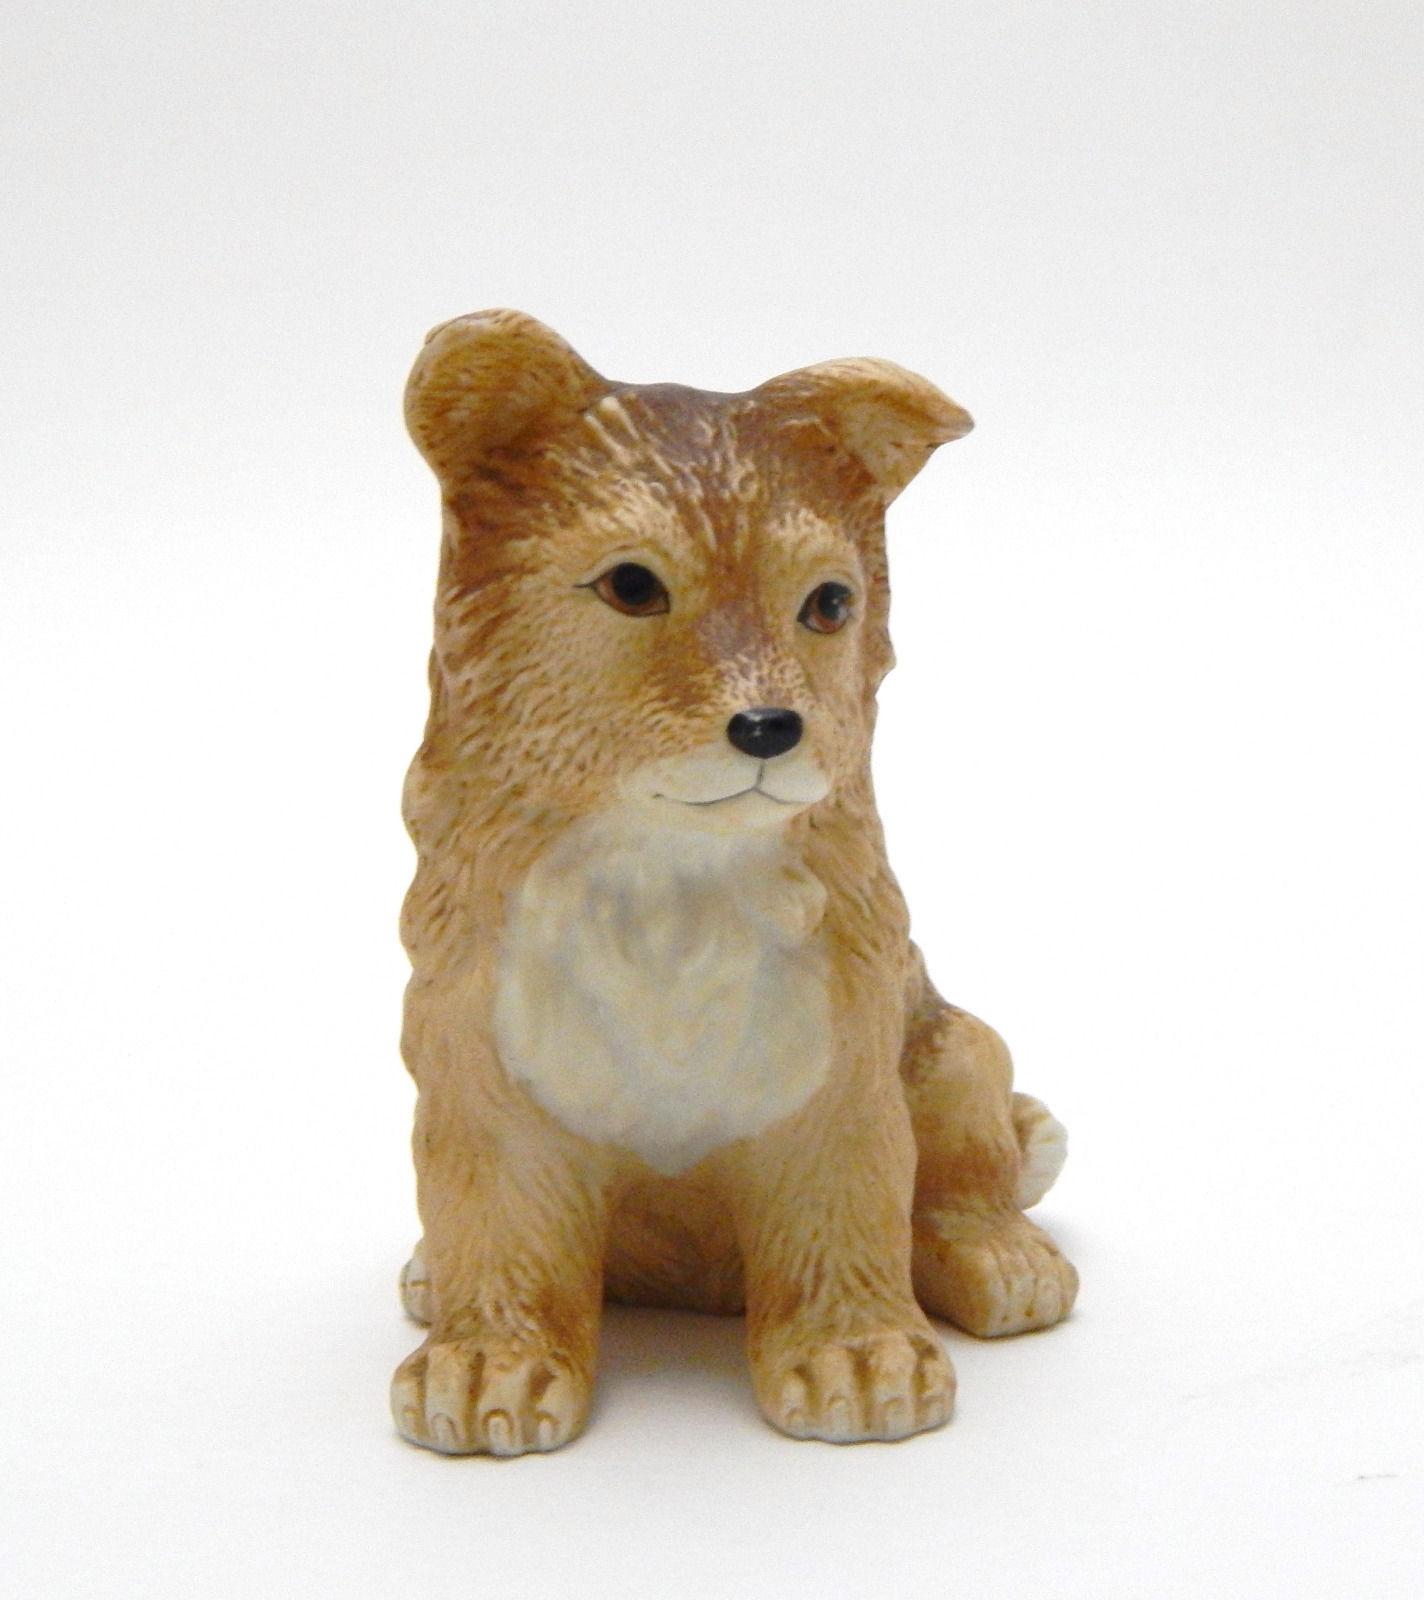 Collie Sheltie Dog Pup Figurine Homco 8828 very good cond. Vintage